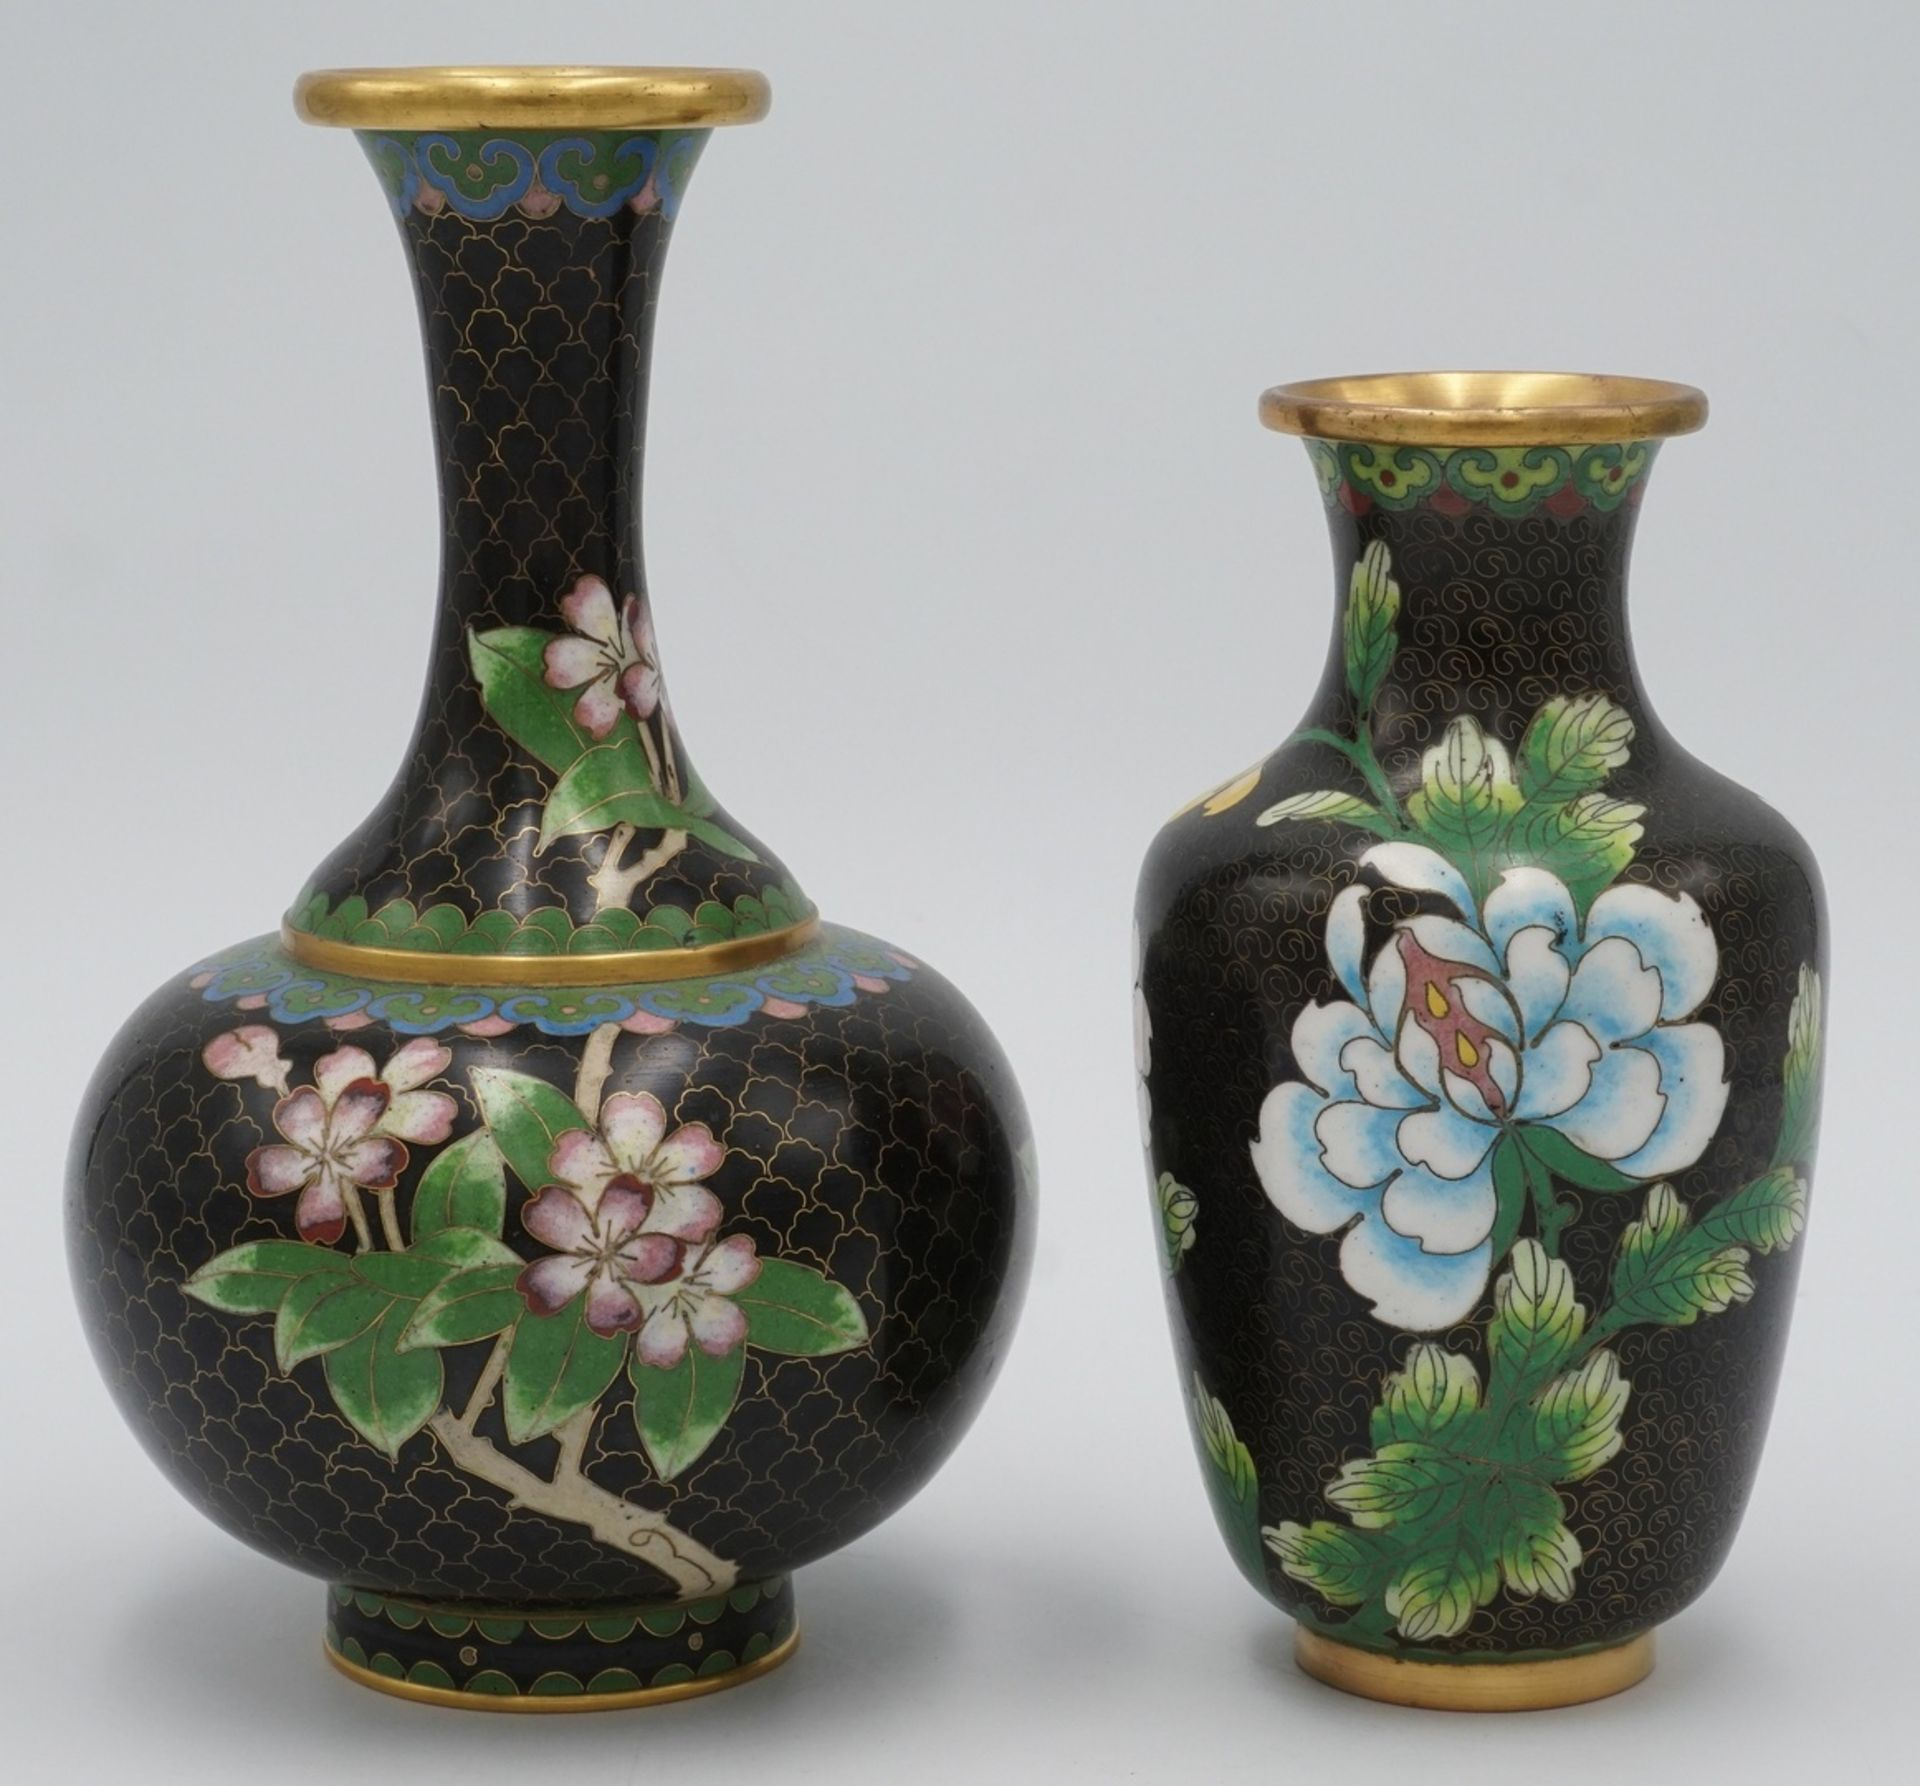 Zwei Cloisonné Vasen, China, 20. Jh.